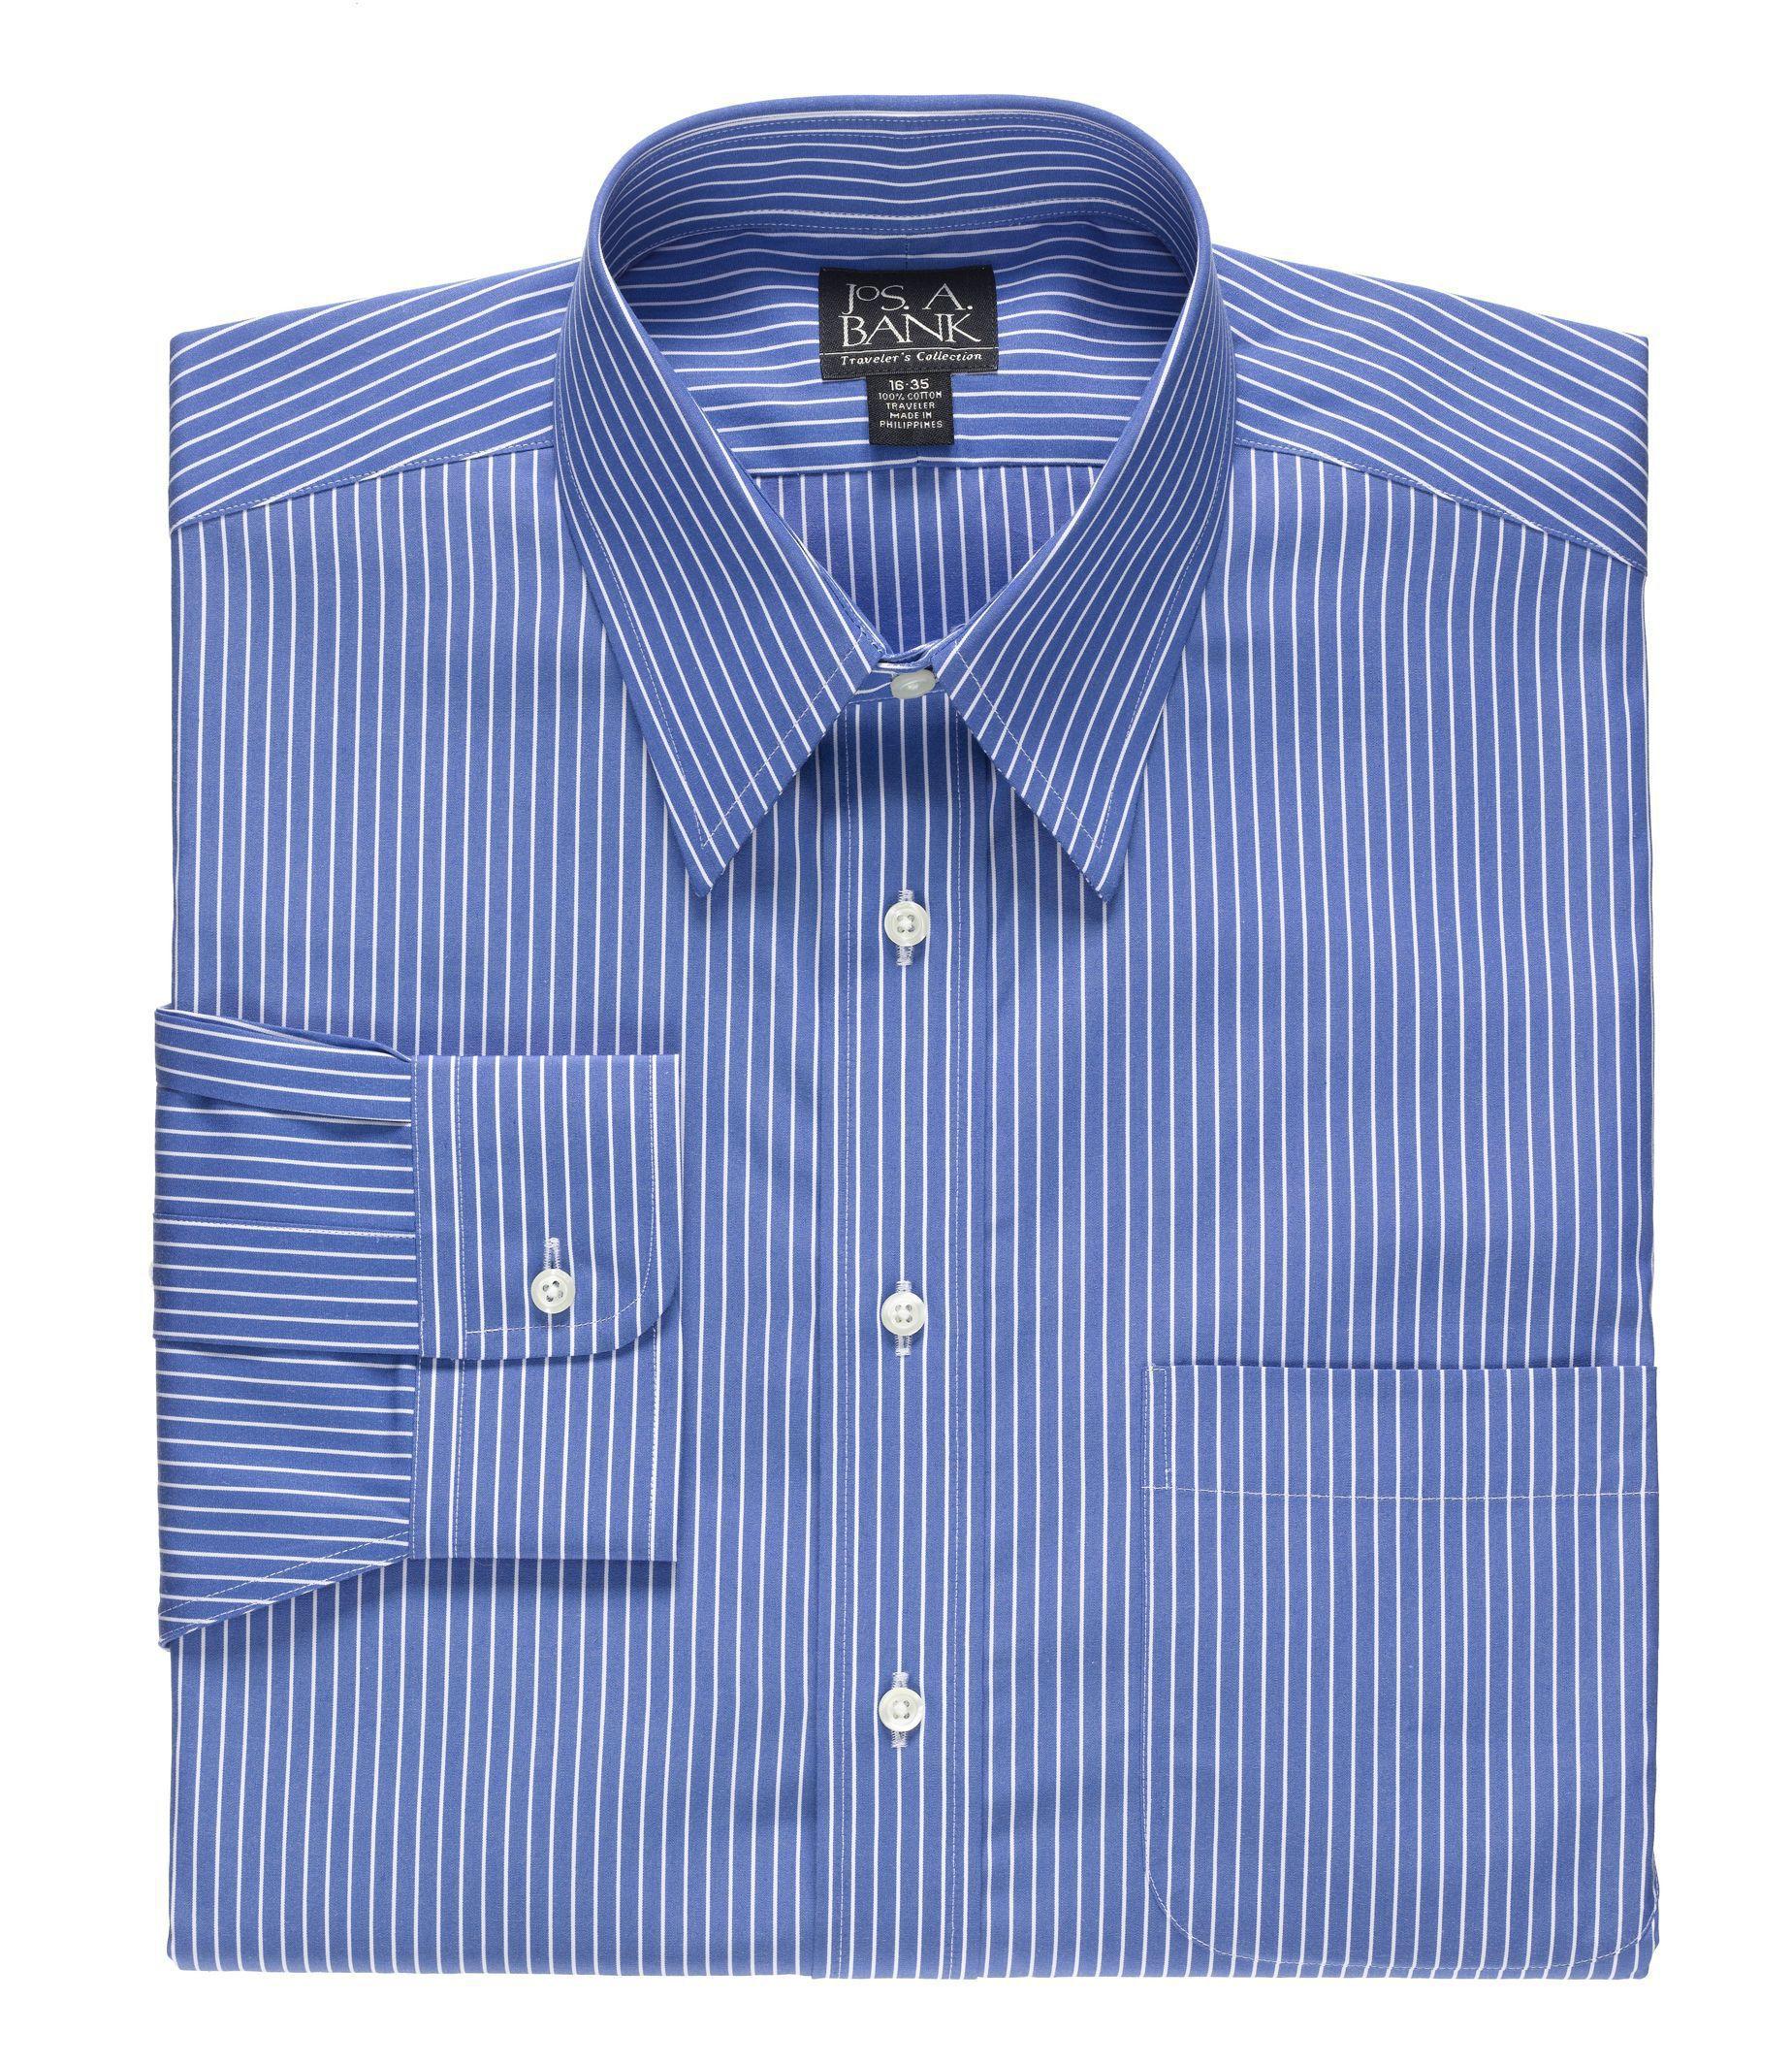 Traveler Wrinkle Free Slim Fit Point Collar Dress Shirt